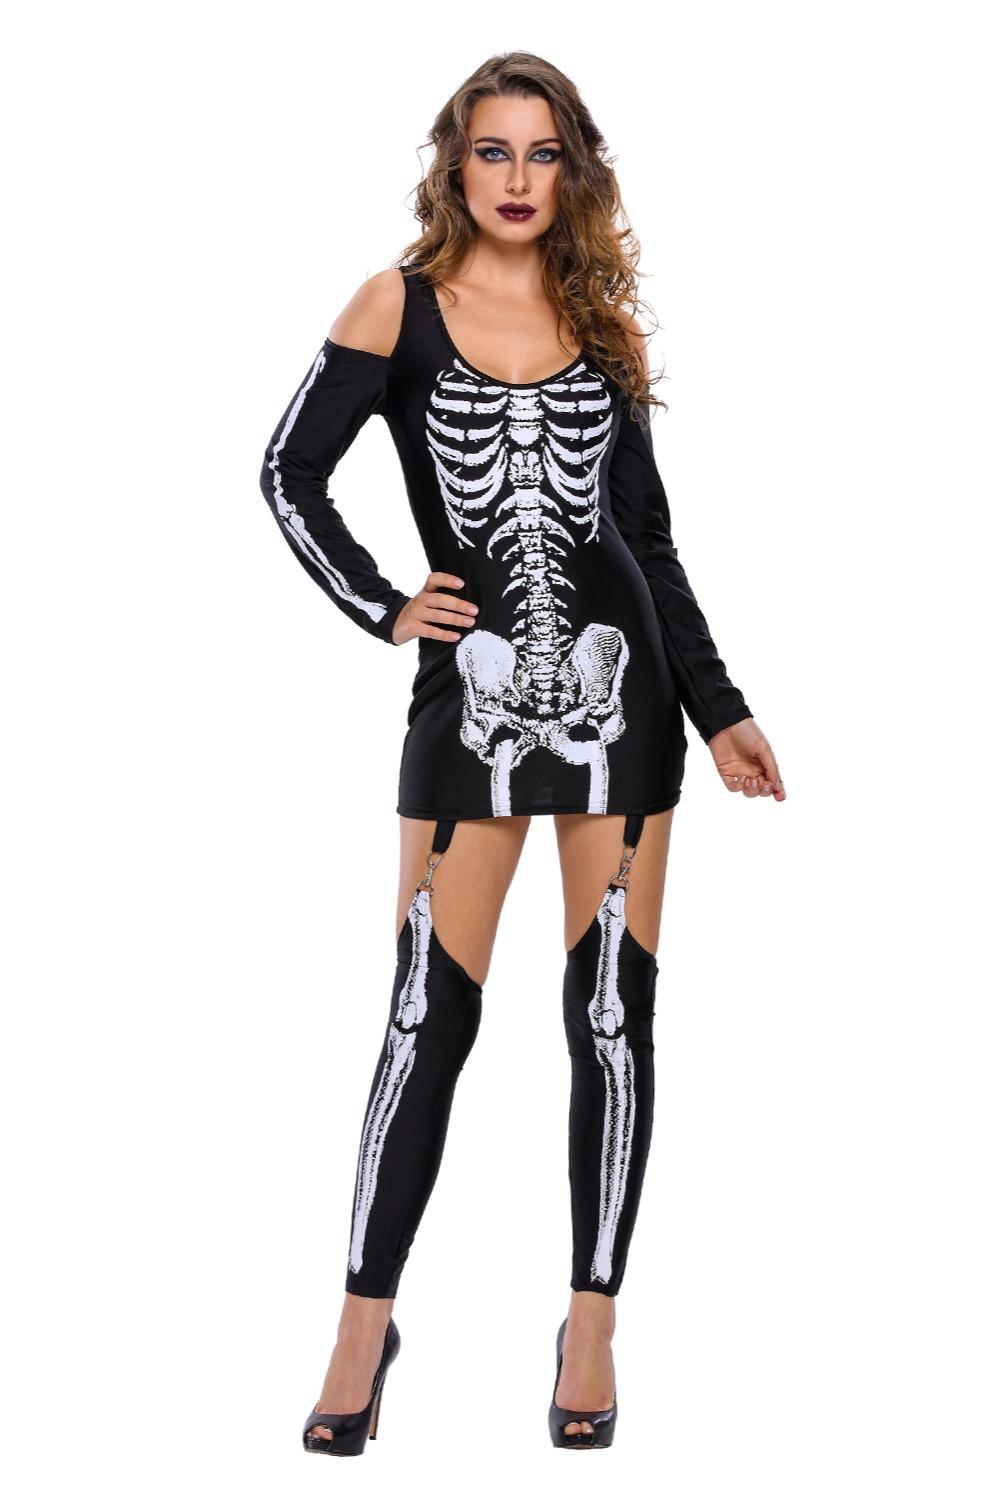 X-rayed-Halloween-Off-shoulder-Skeleton-Dress-Costume-LC89025-2-1